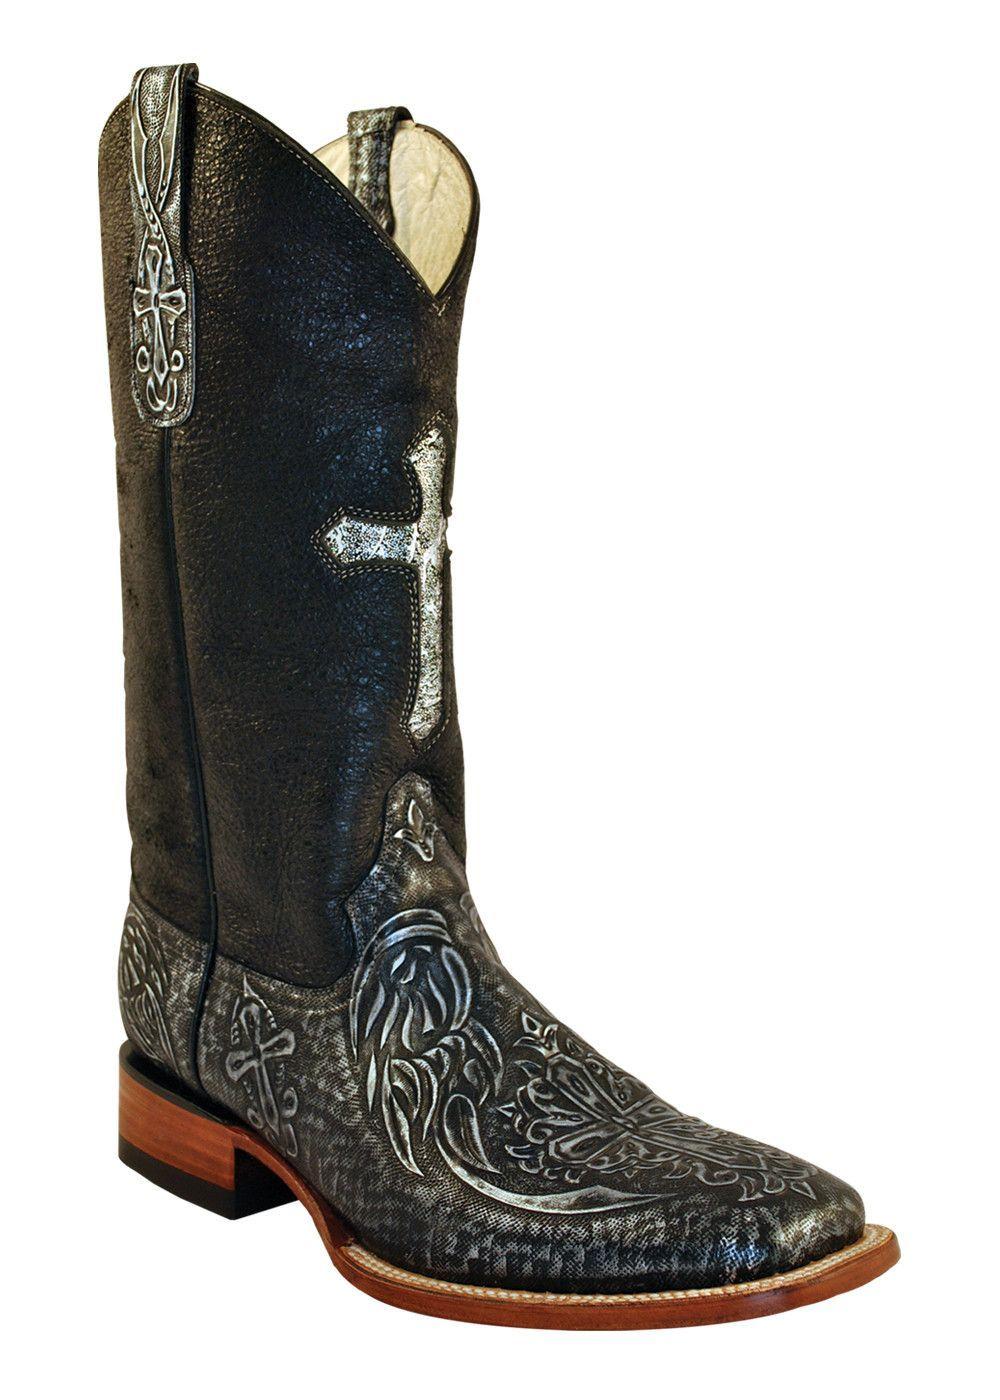 1b1ff526f84 Womens Ferrini Black Silver Embossed Cross Leather Western S Toe ...